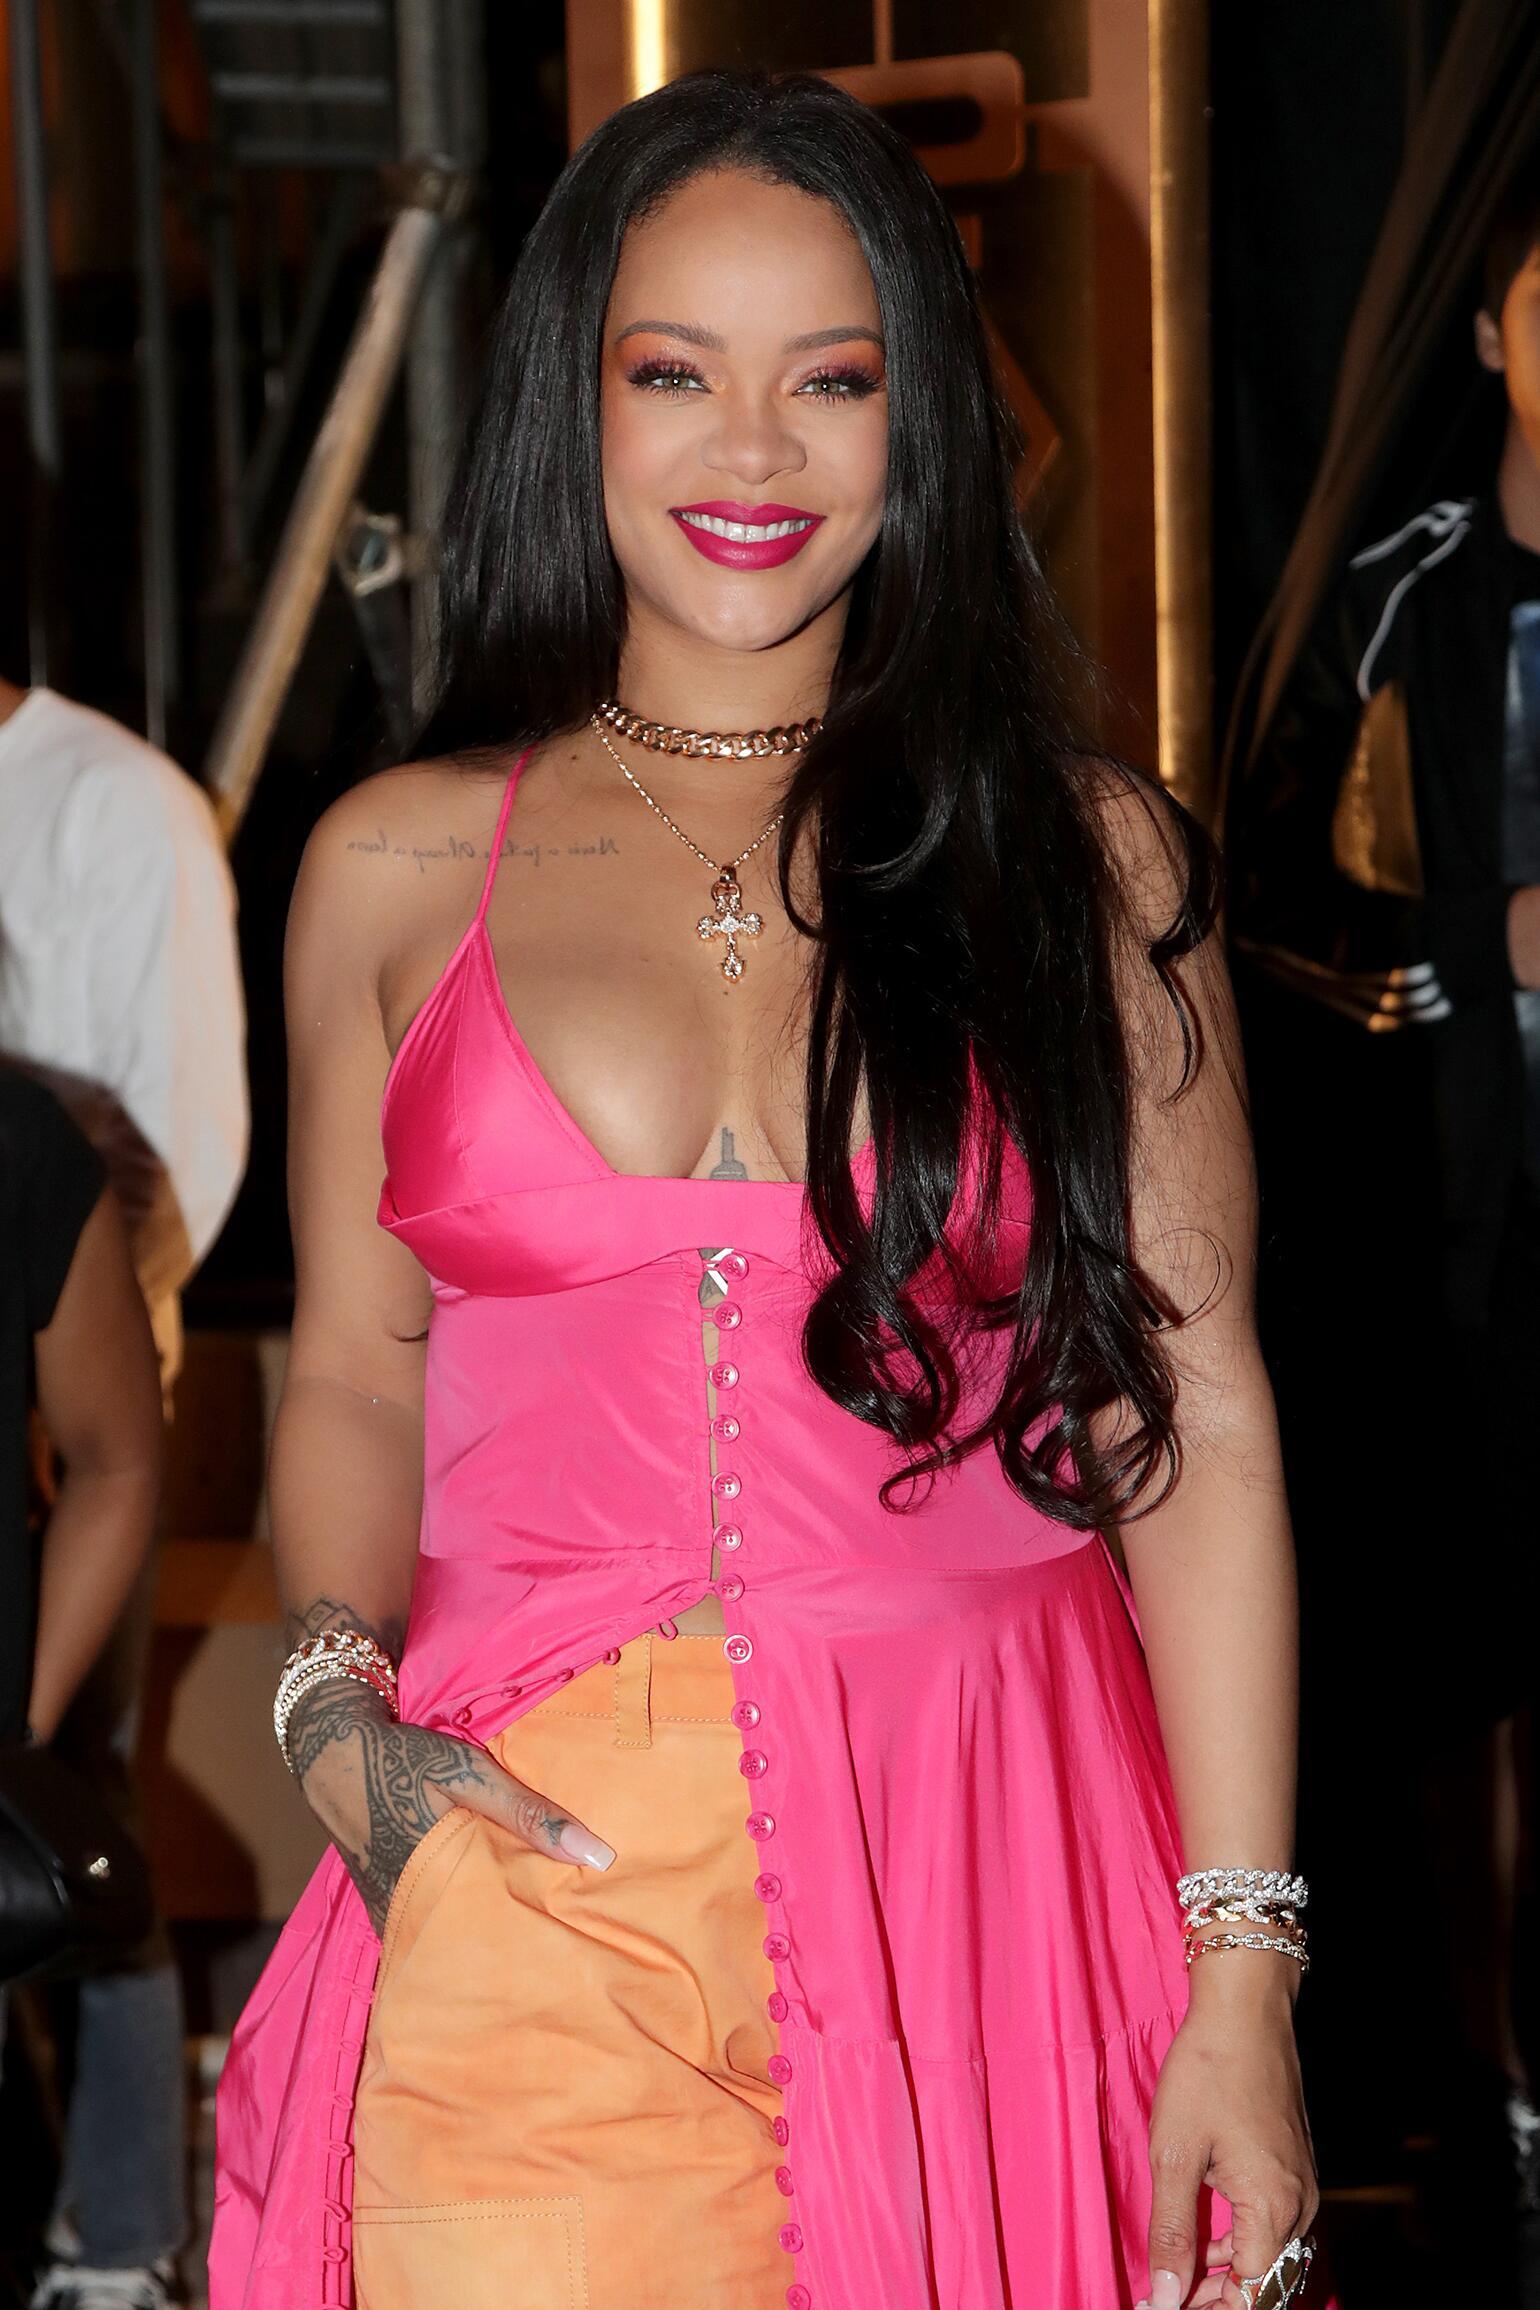 Rihanna_SistersOfTheYear_GettyImages-1175540252.jpg